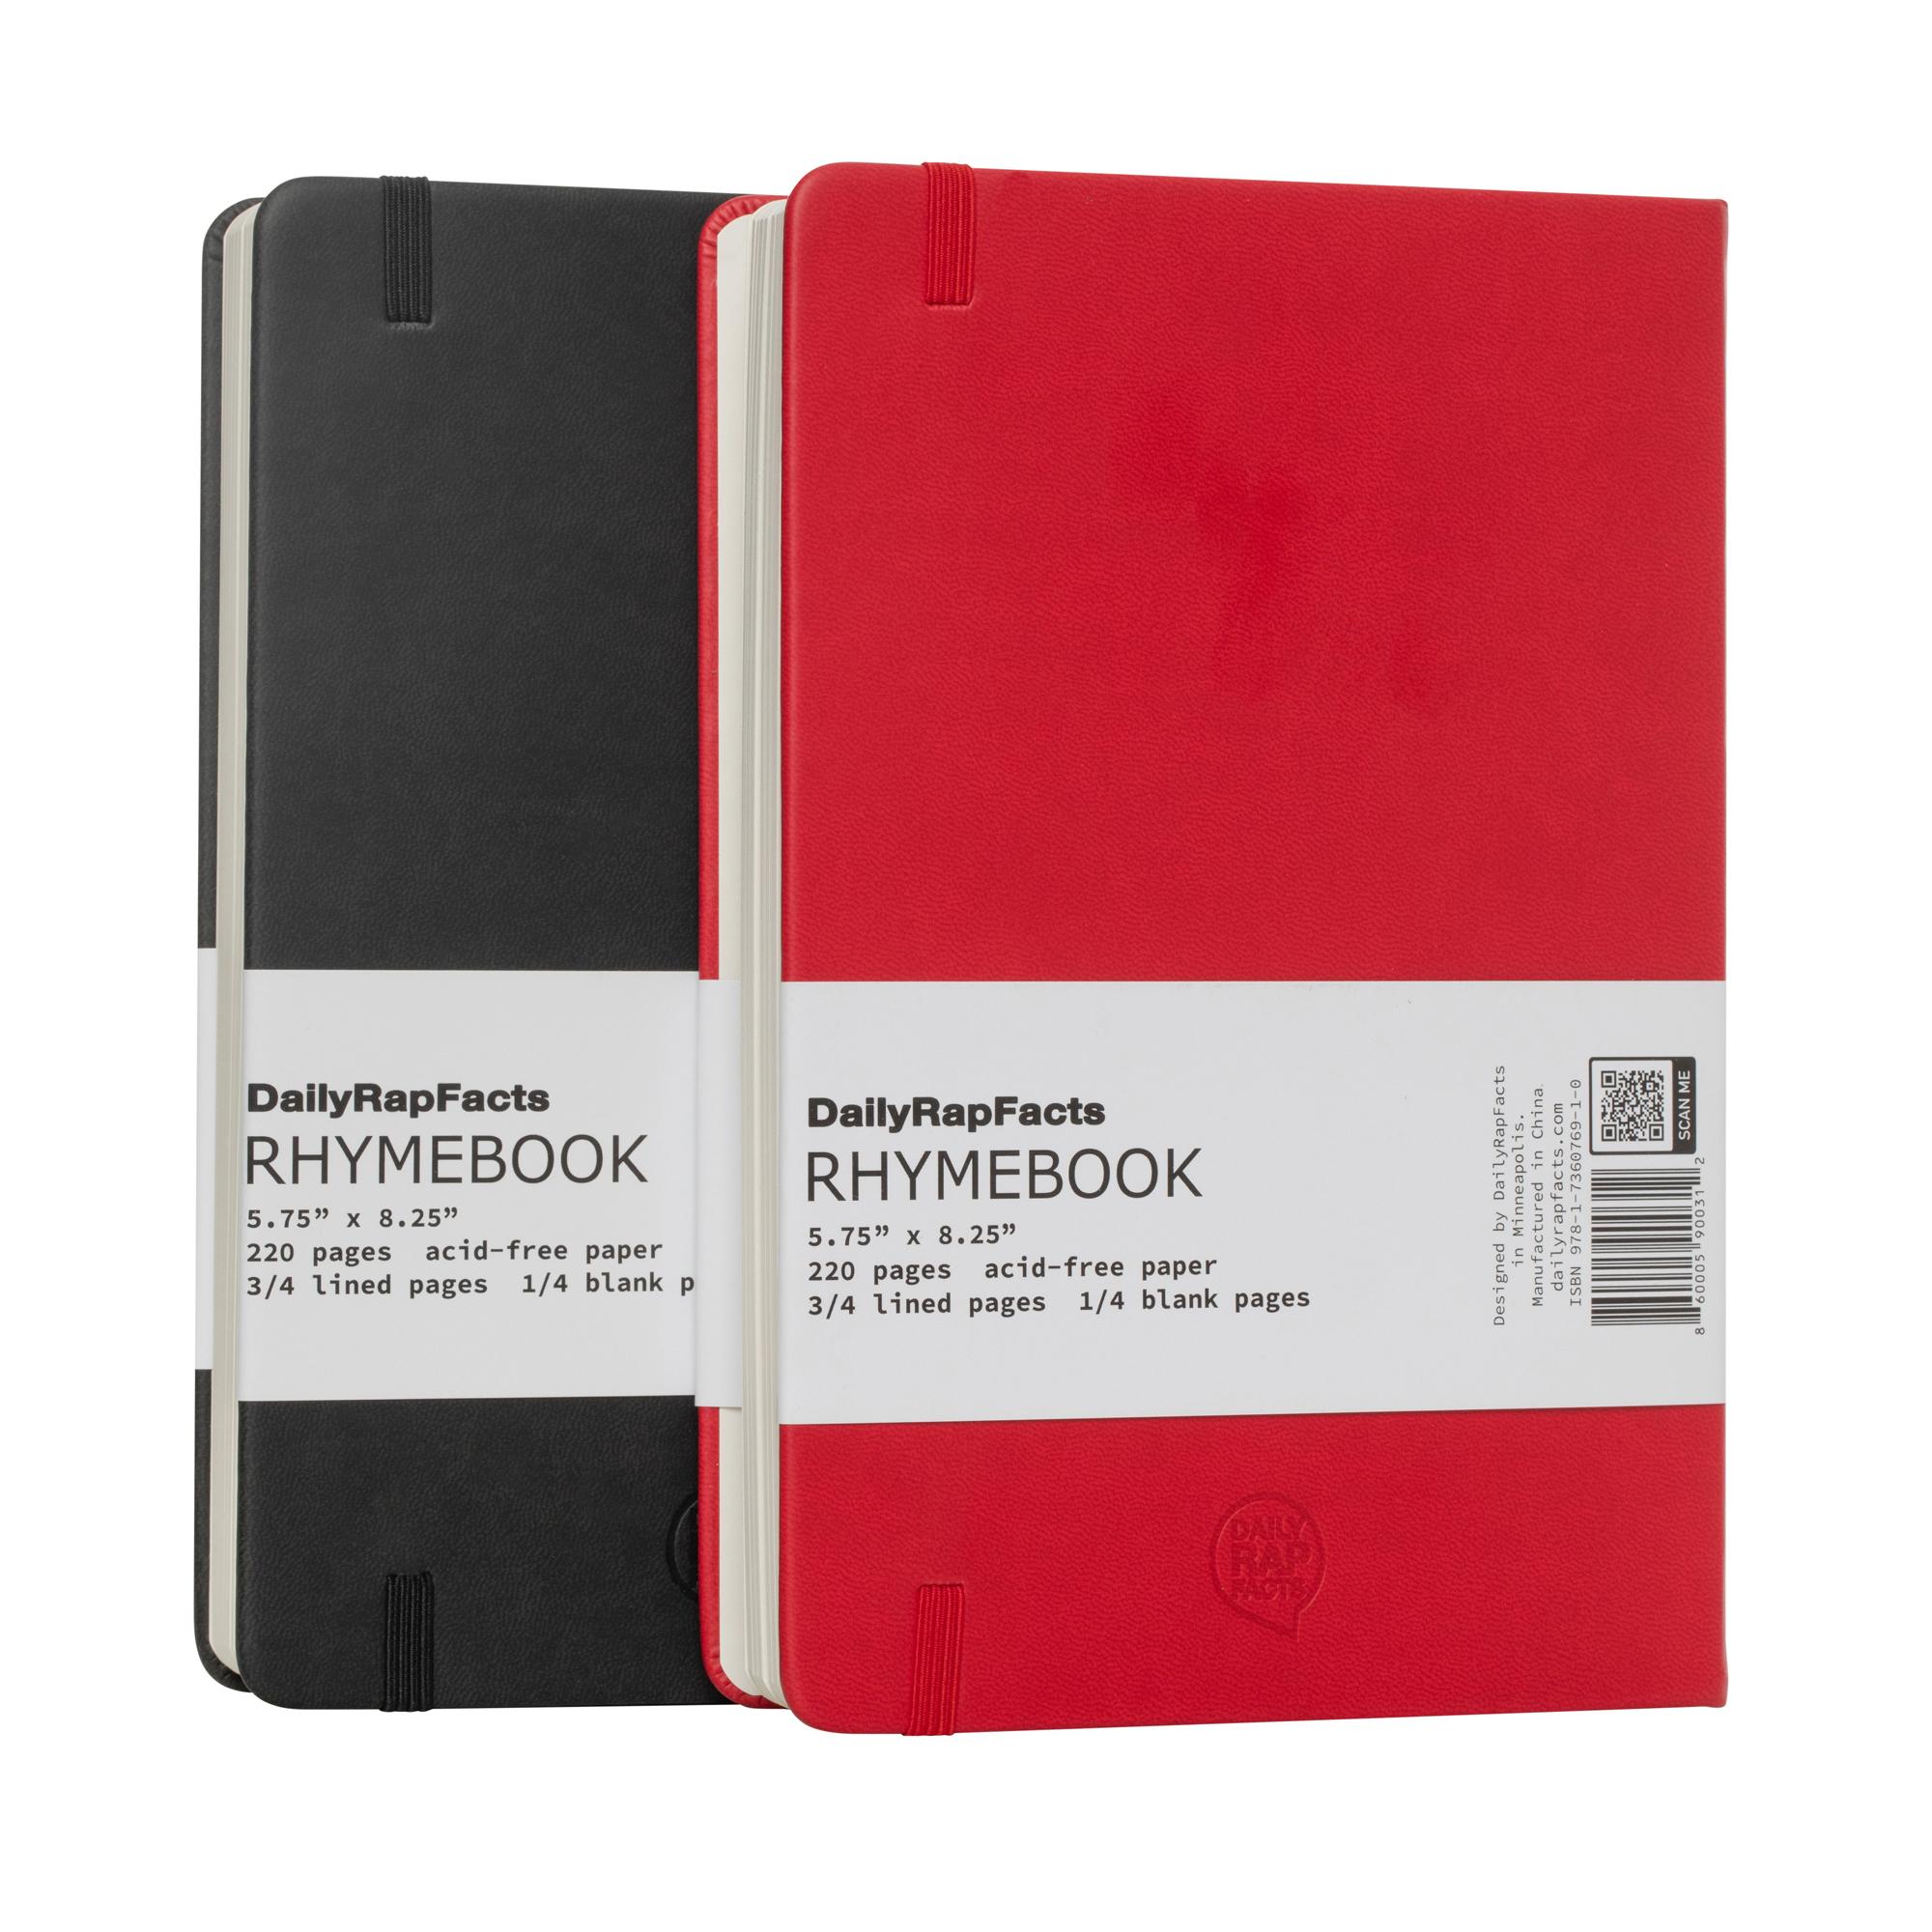 Back of Rhymebooks